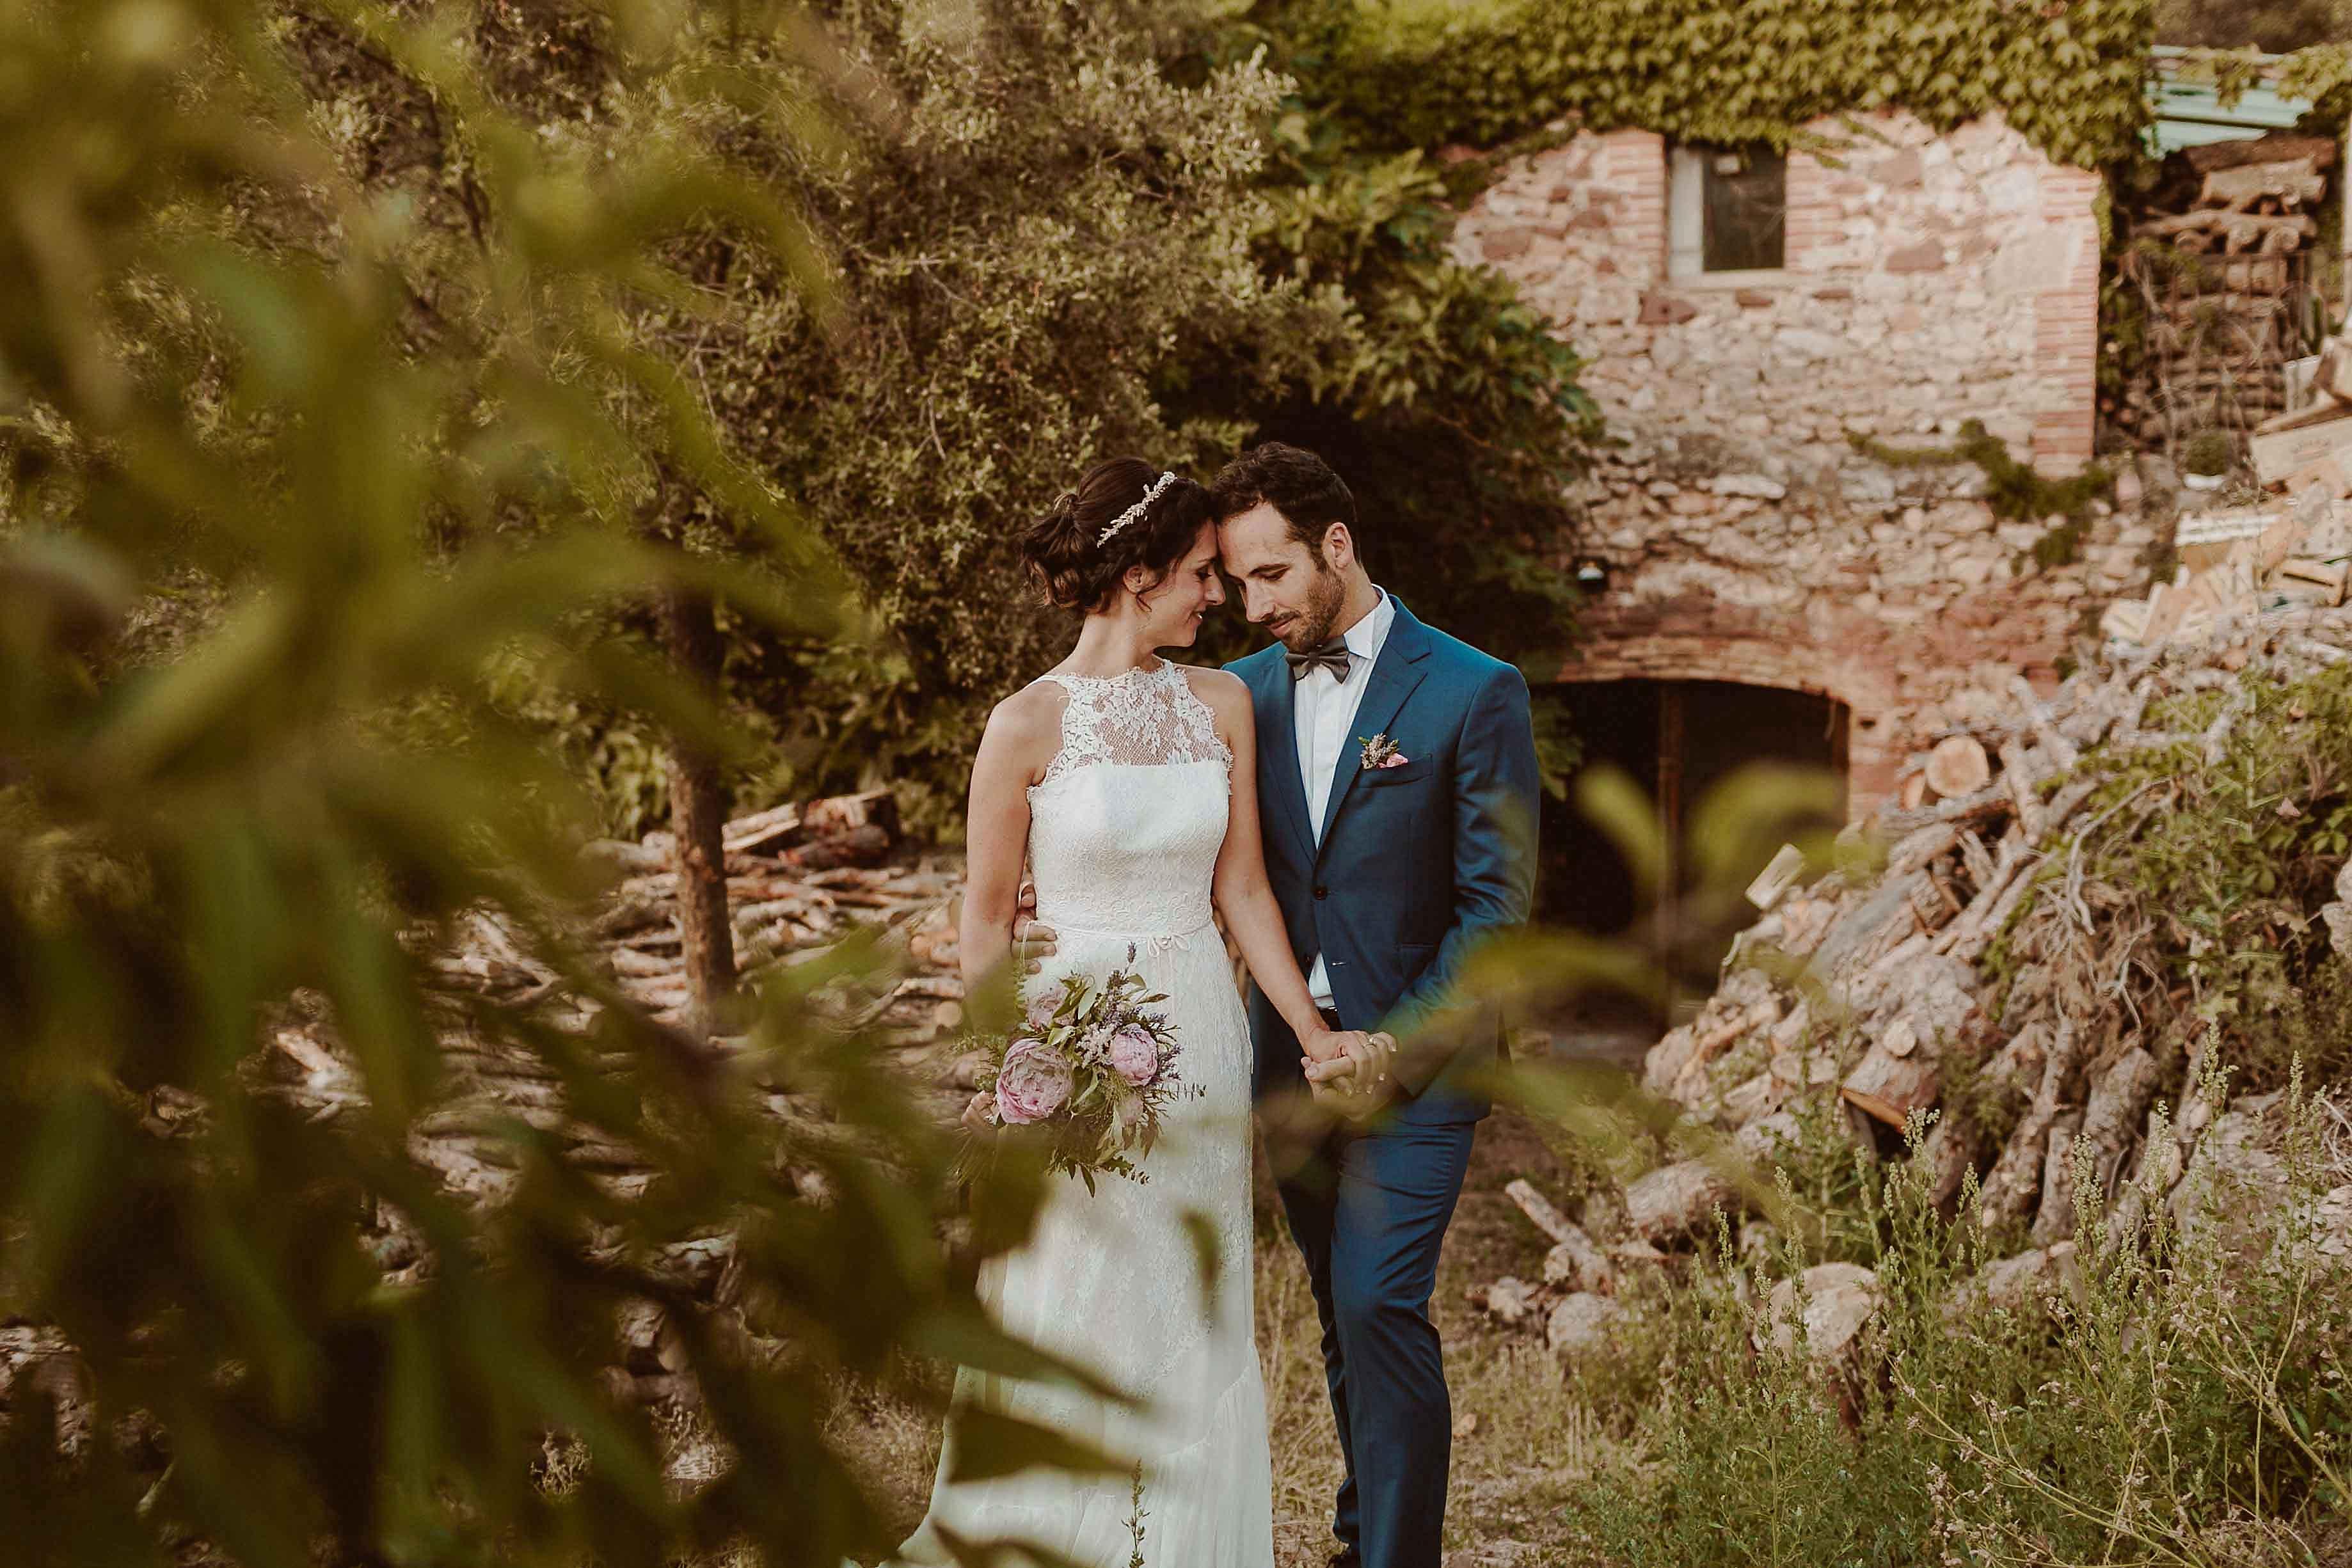 Boda rústica en la montaña. fotgrafo de bodas barcelona_077